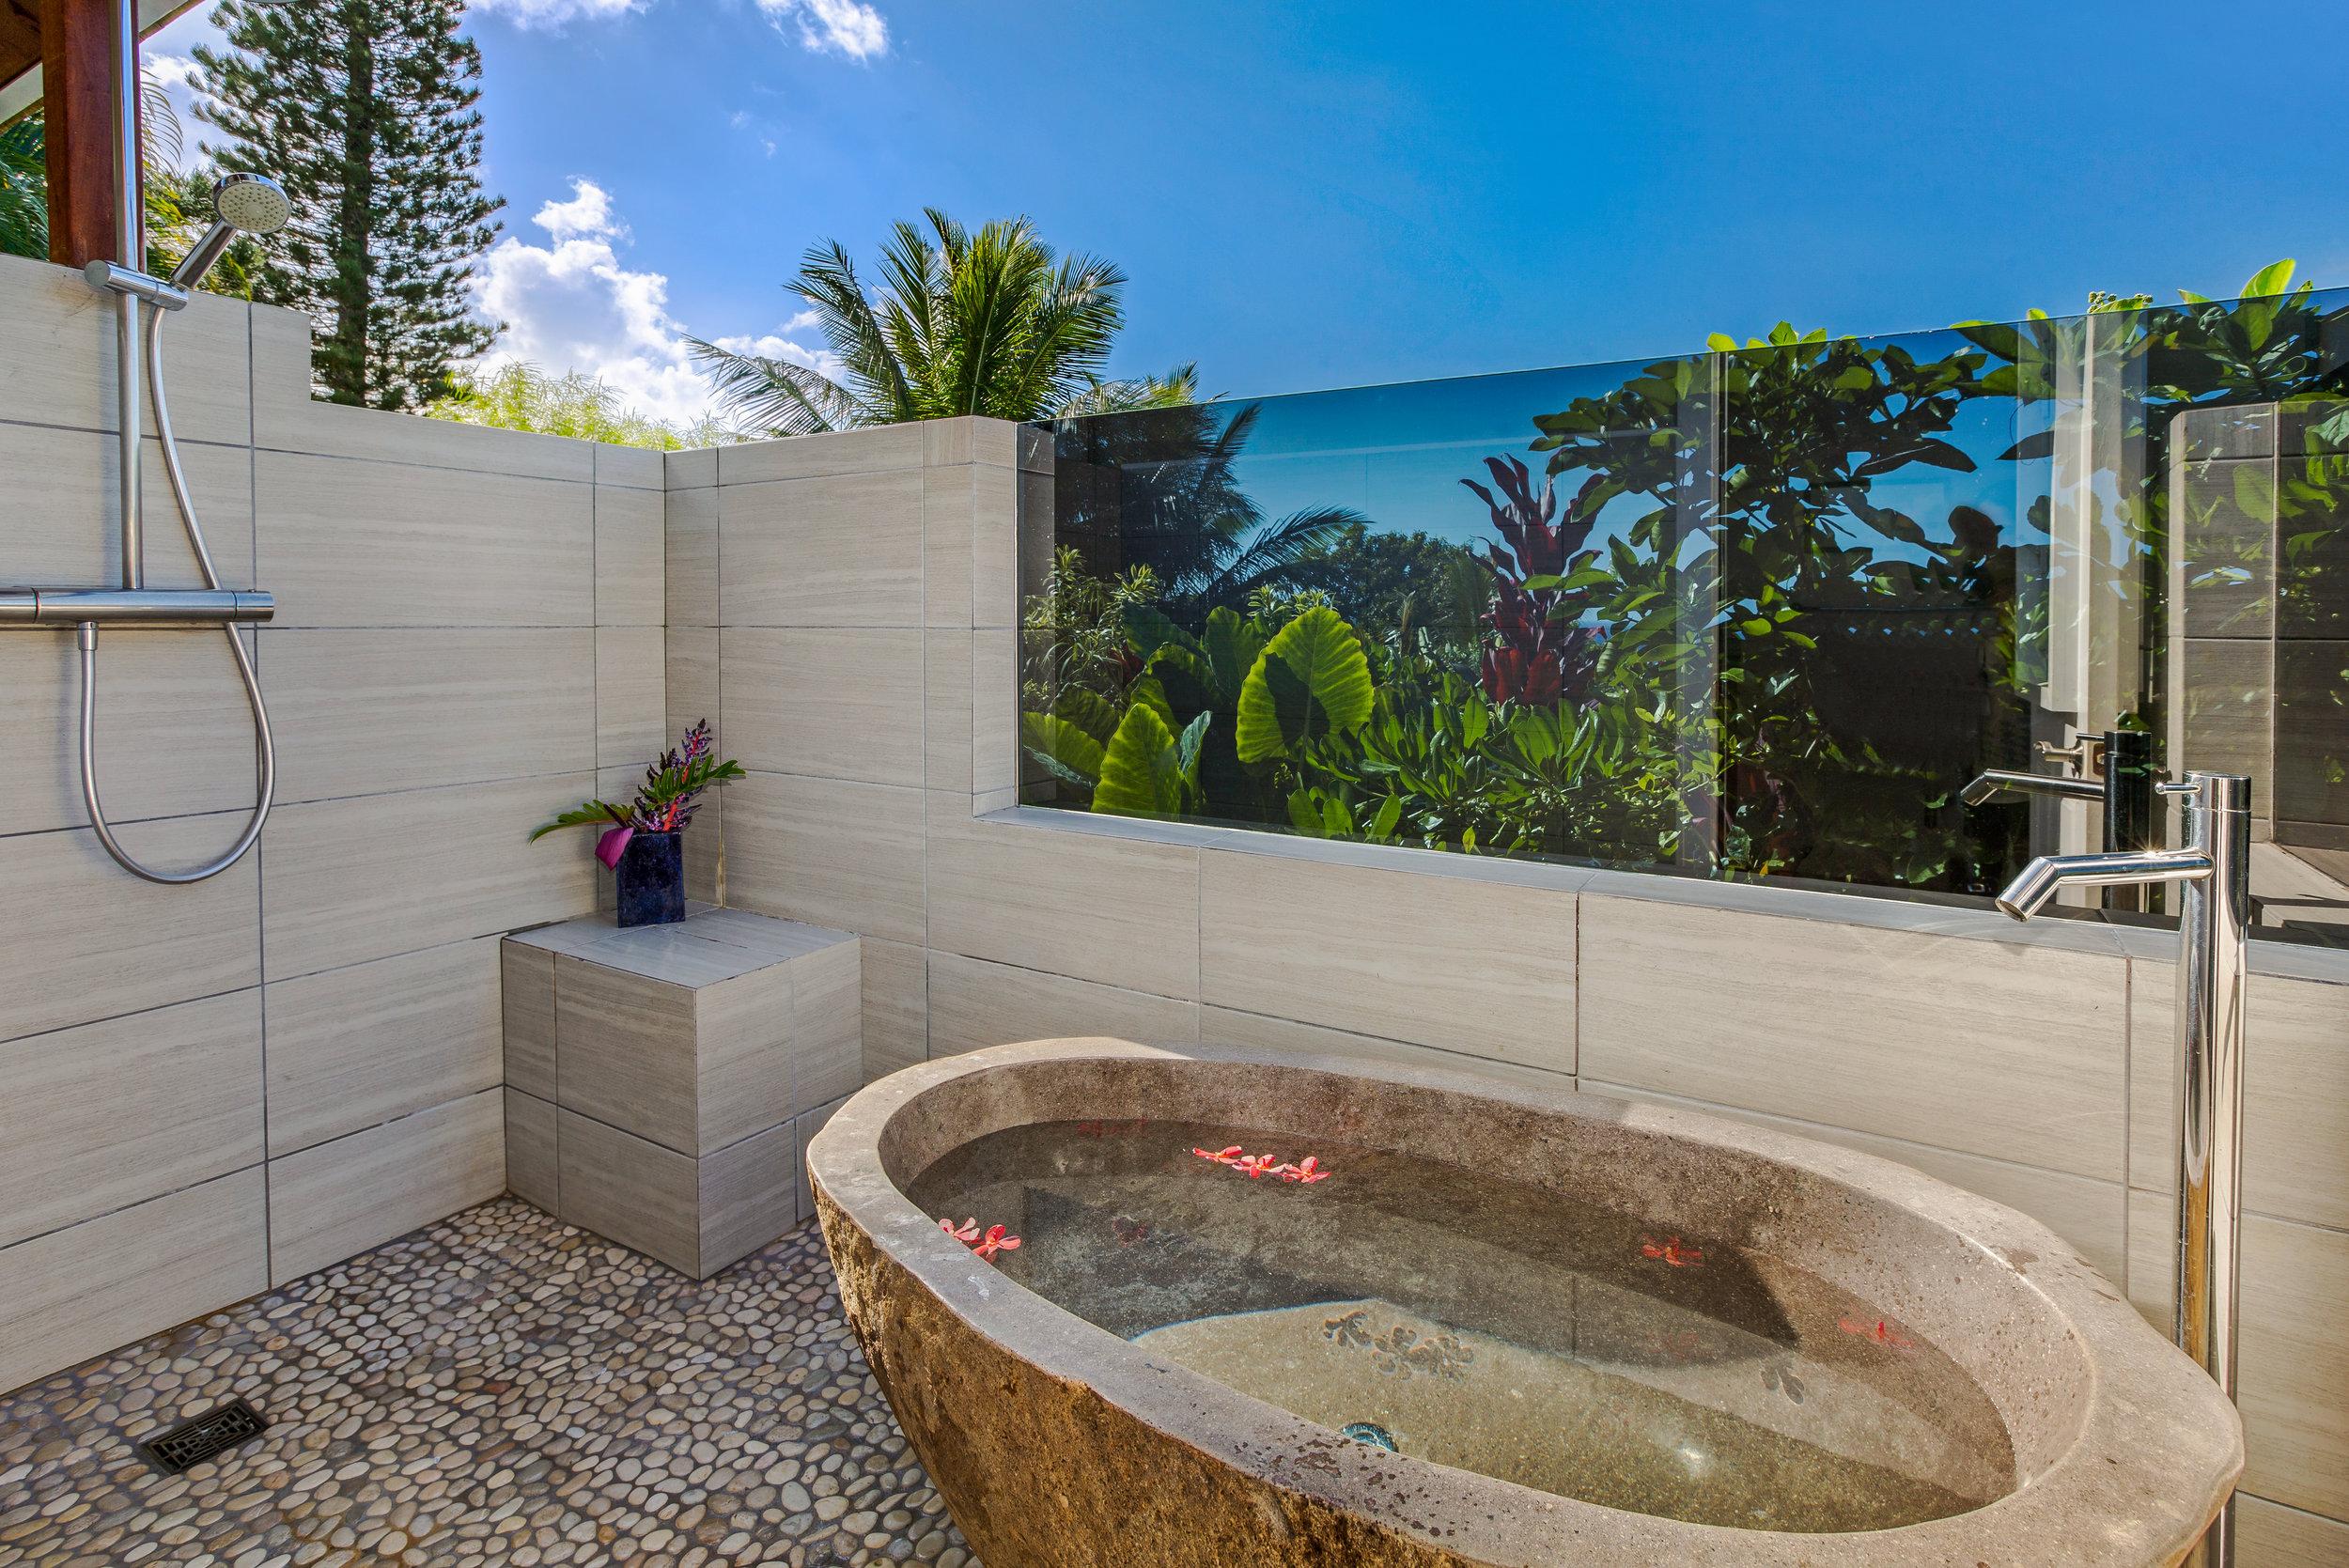 Kauai Vacation-14.jpg